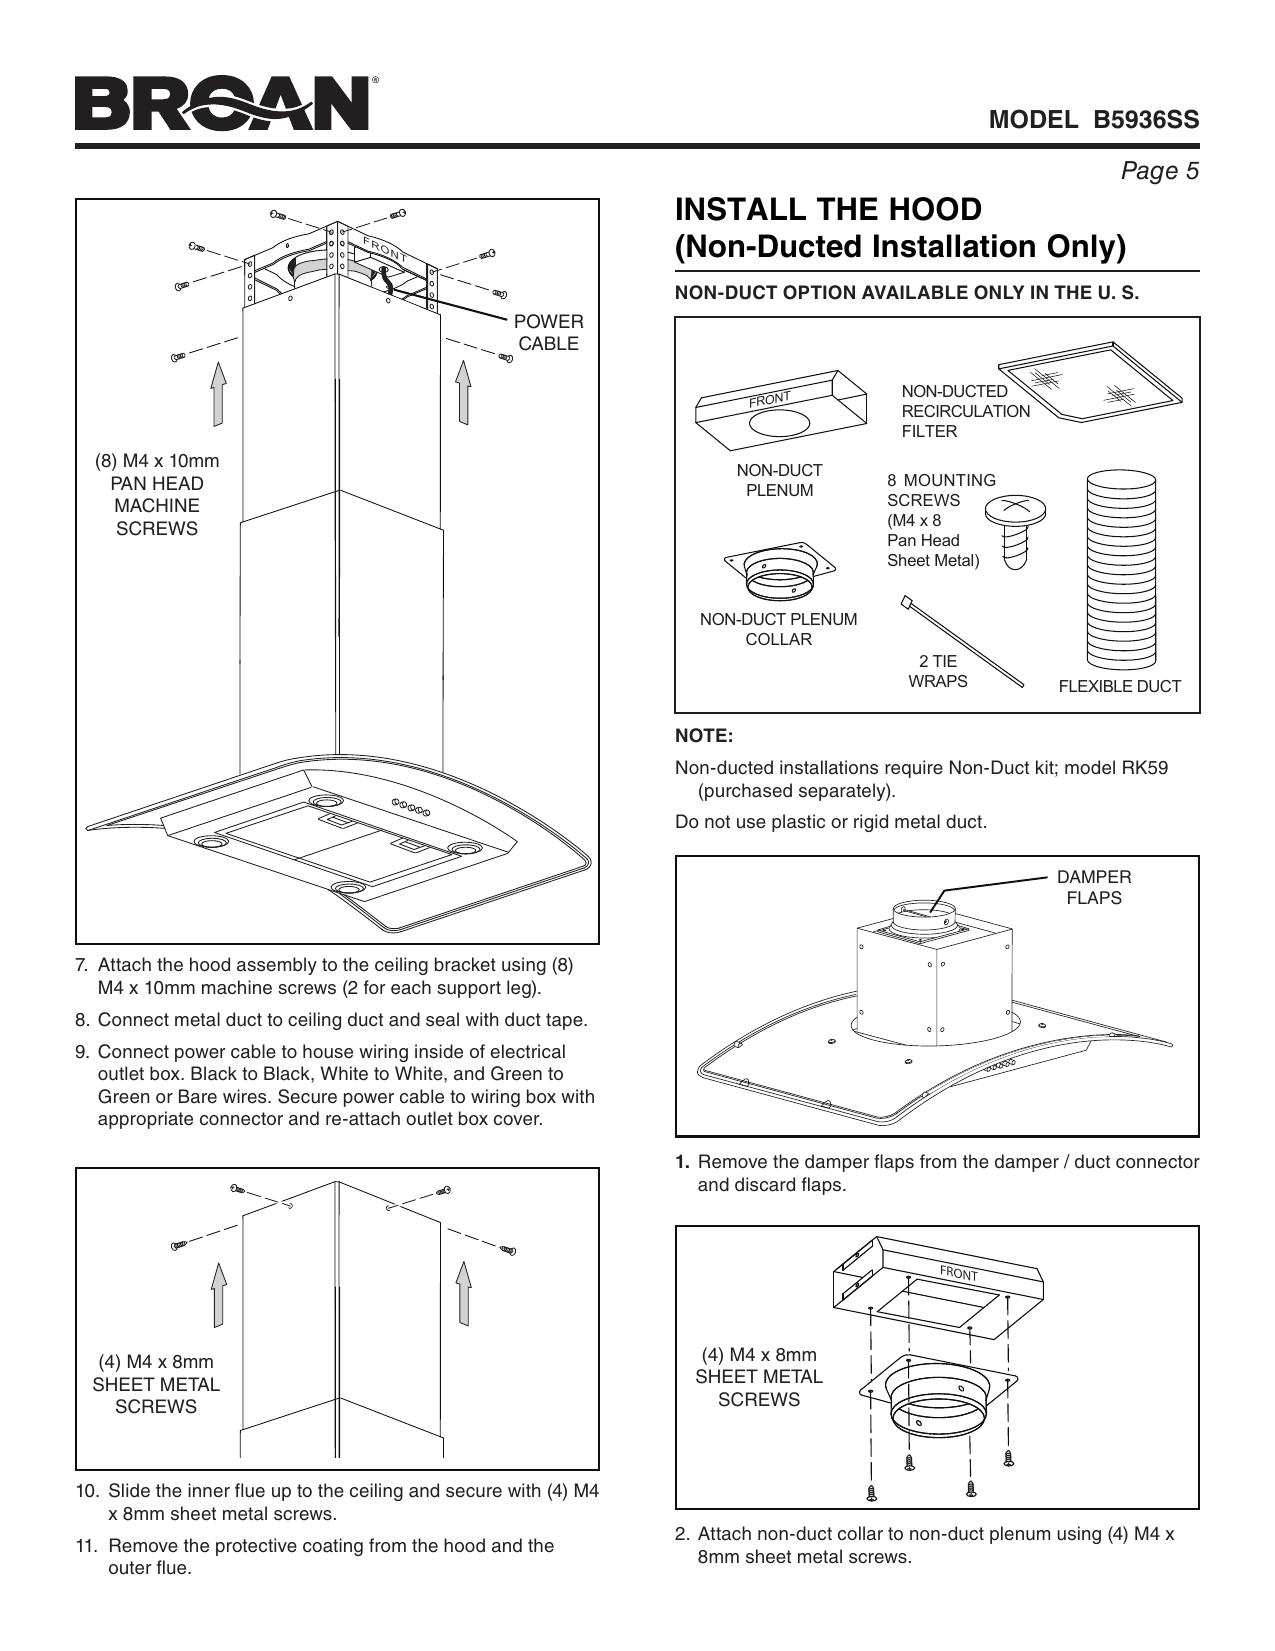 broan wiring diagram install guide wiring diagram section  broan wiring diagram install guide #11